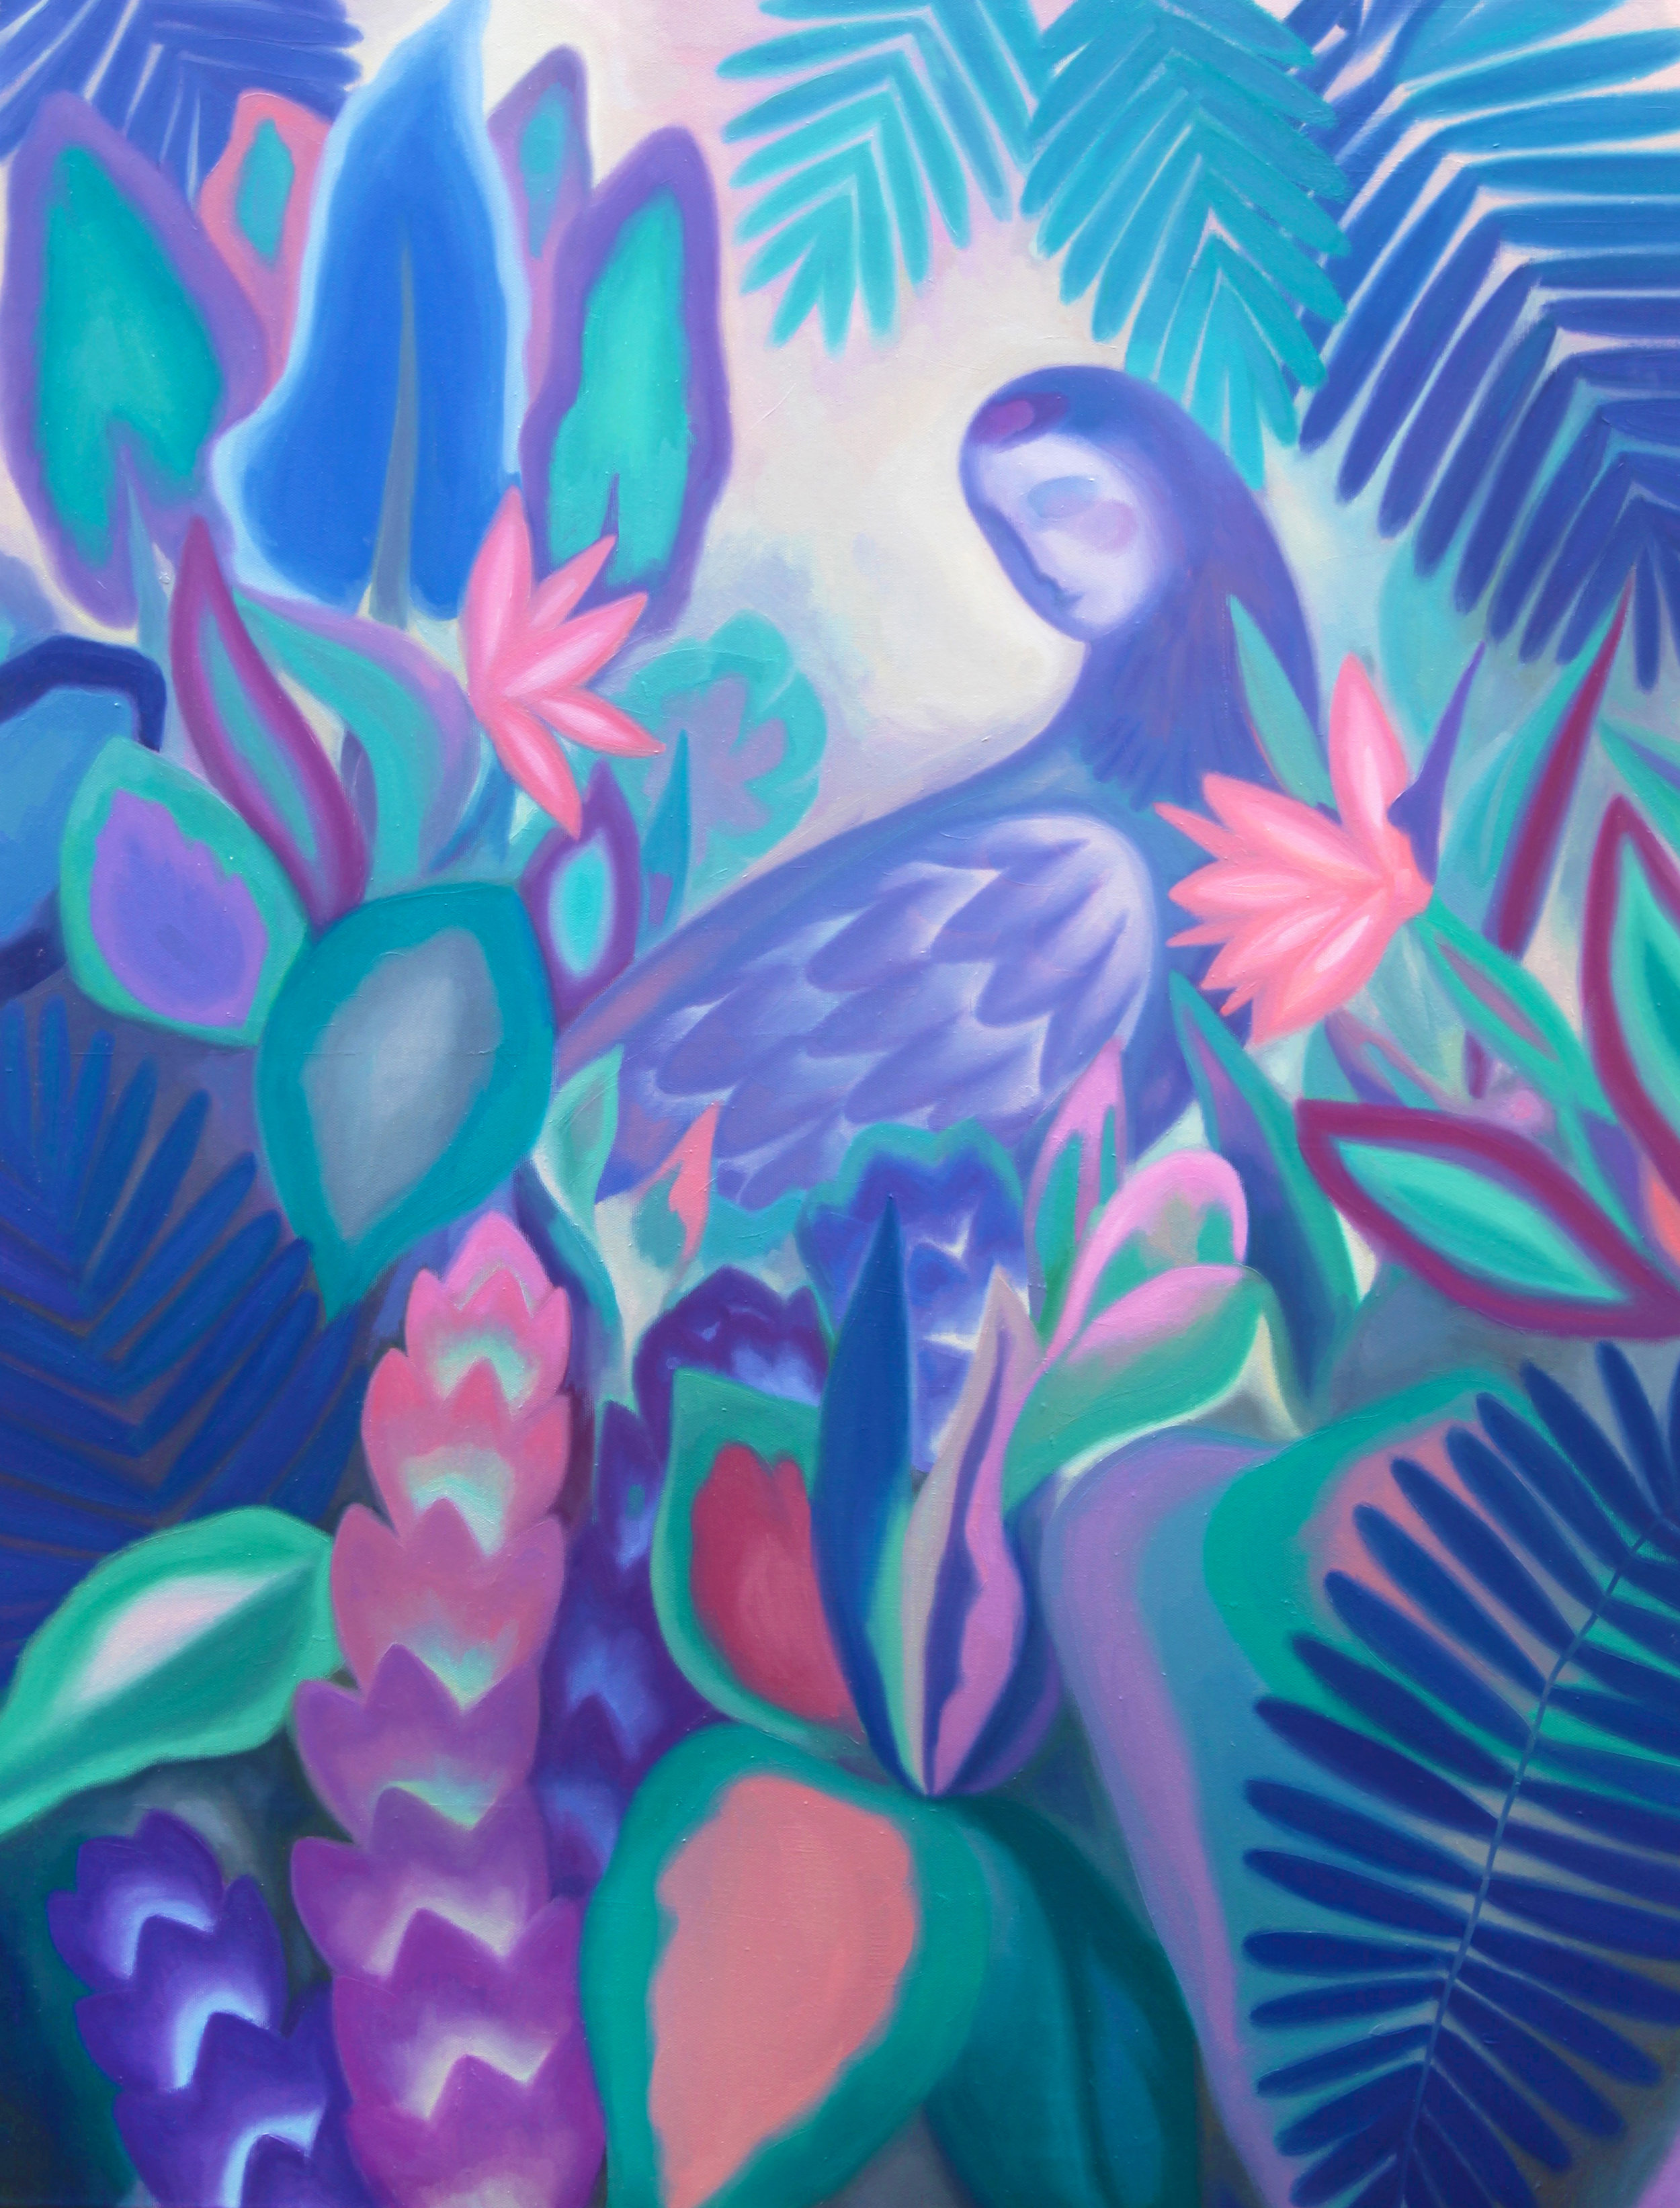 Natura natura  , 2018, oil on linen canvas, 116x89cm